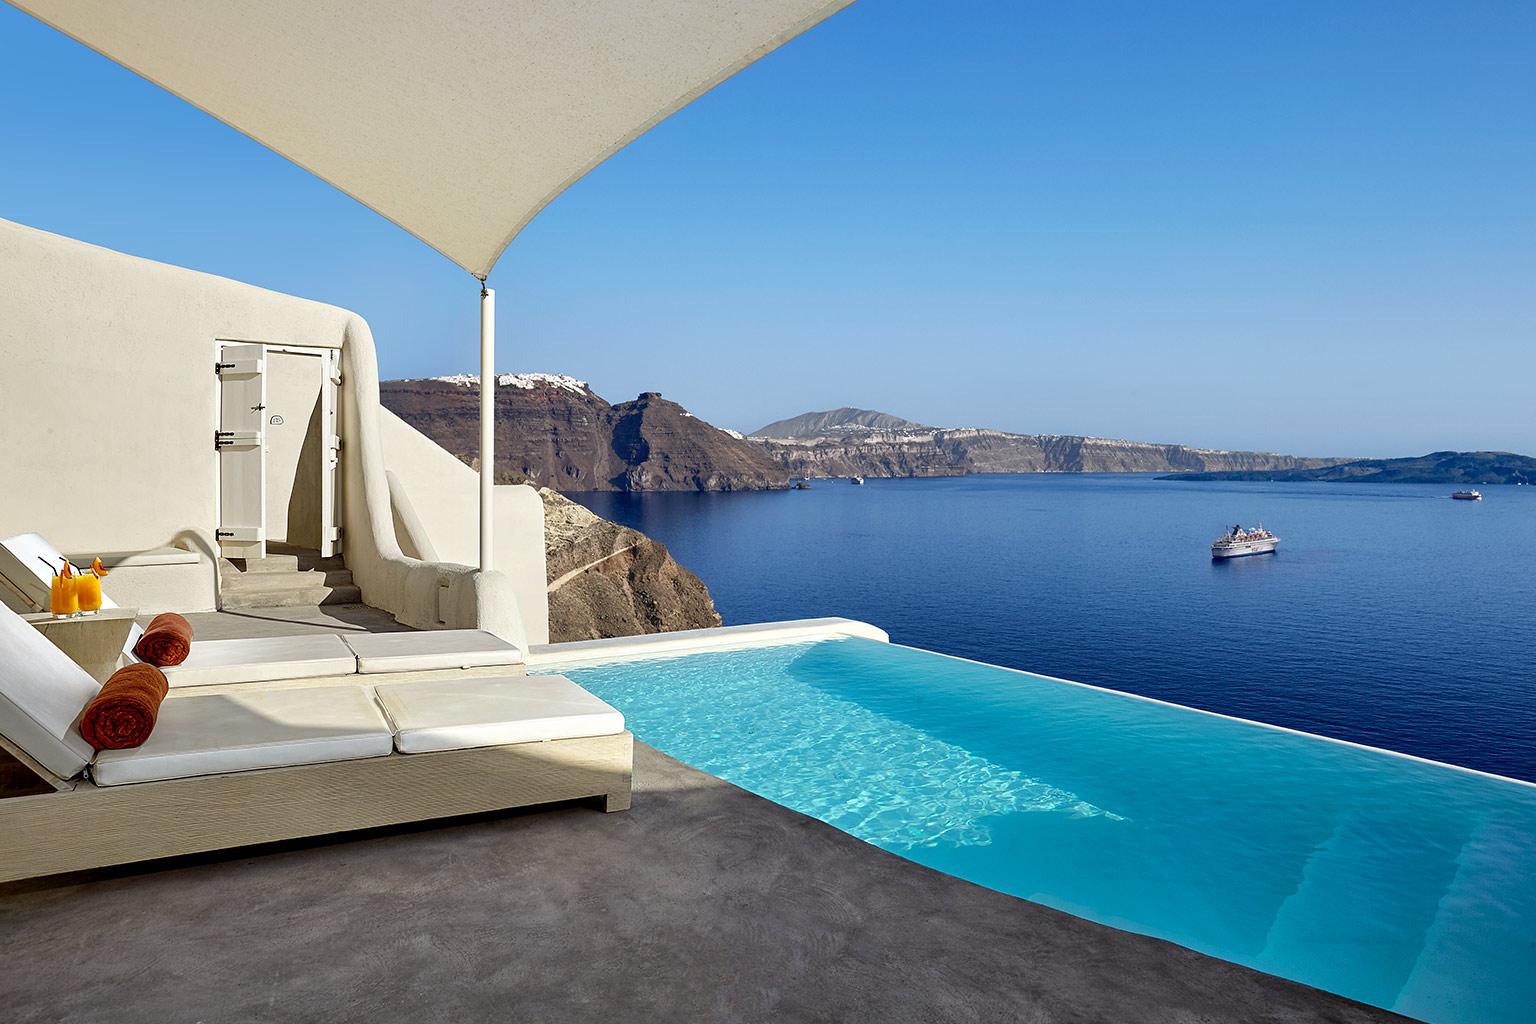 mystique resort santorin luxushotels bei designreisen. Black Bedroom Furniture Sets. Home Design Ideas